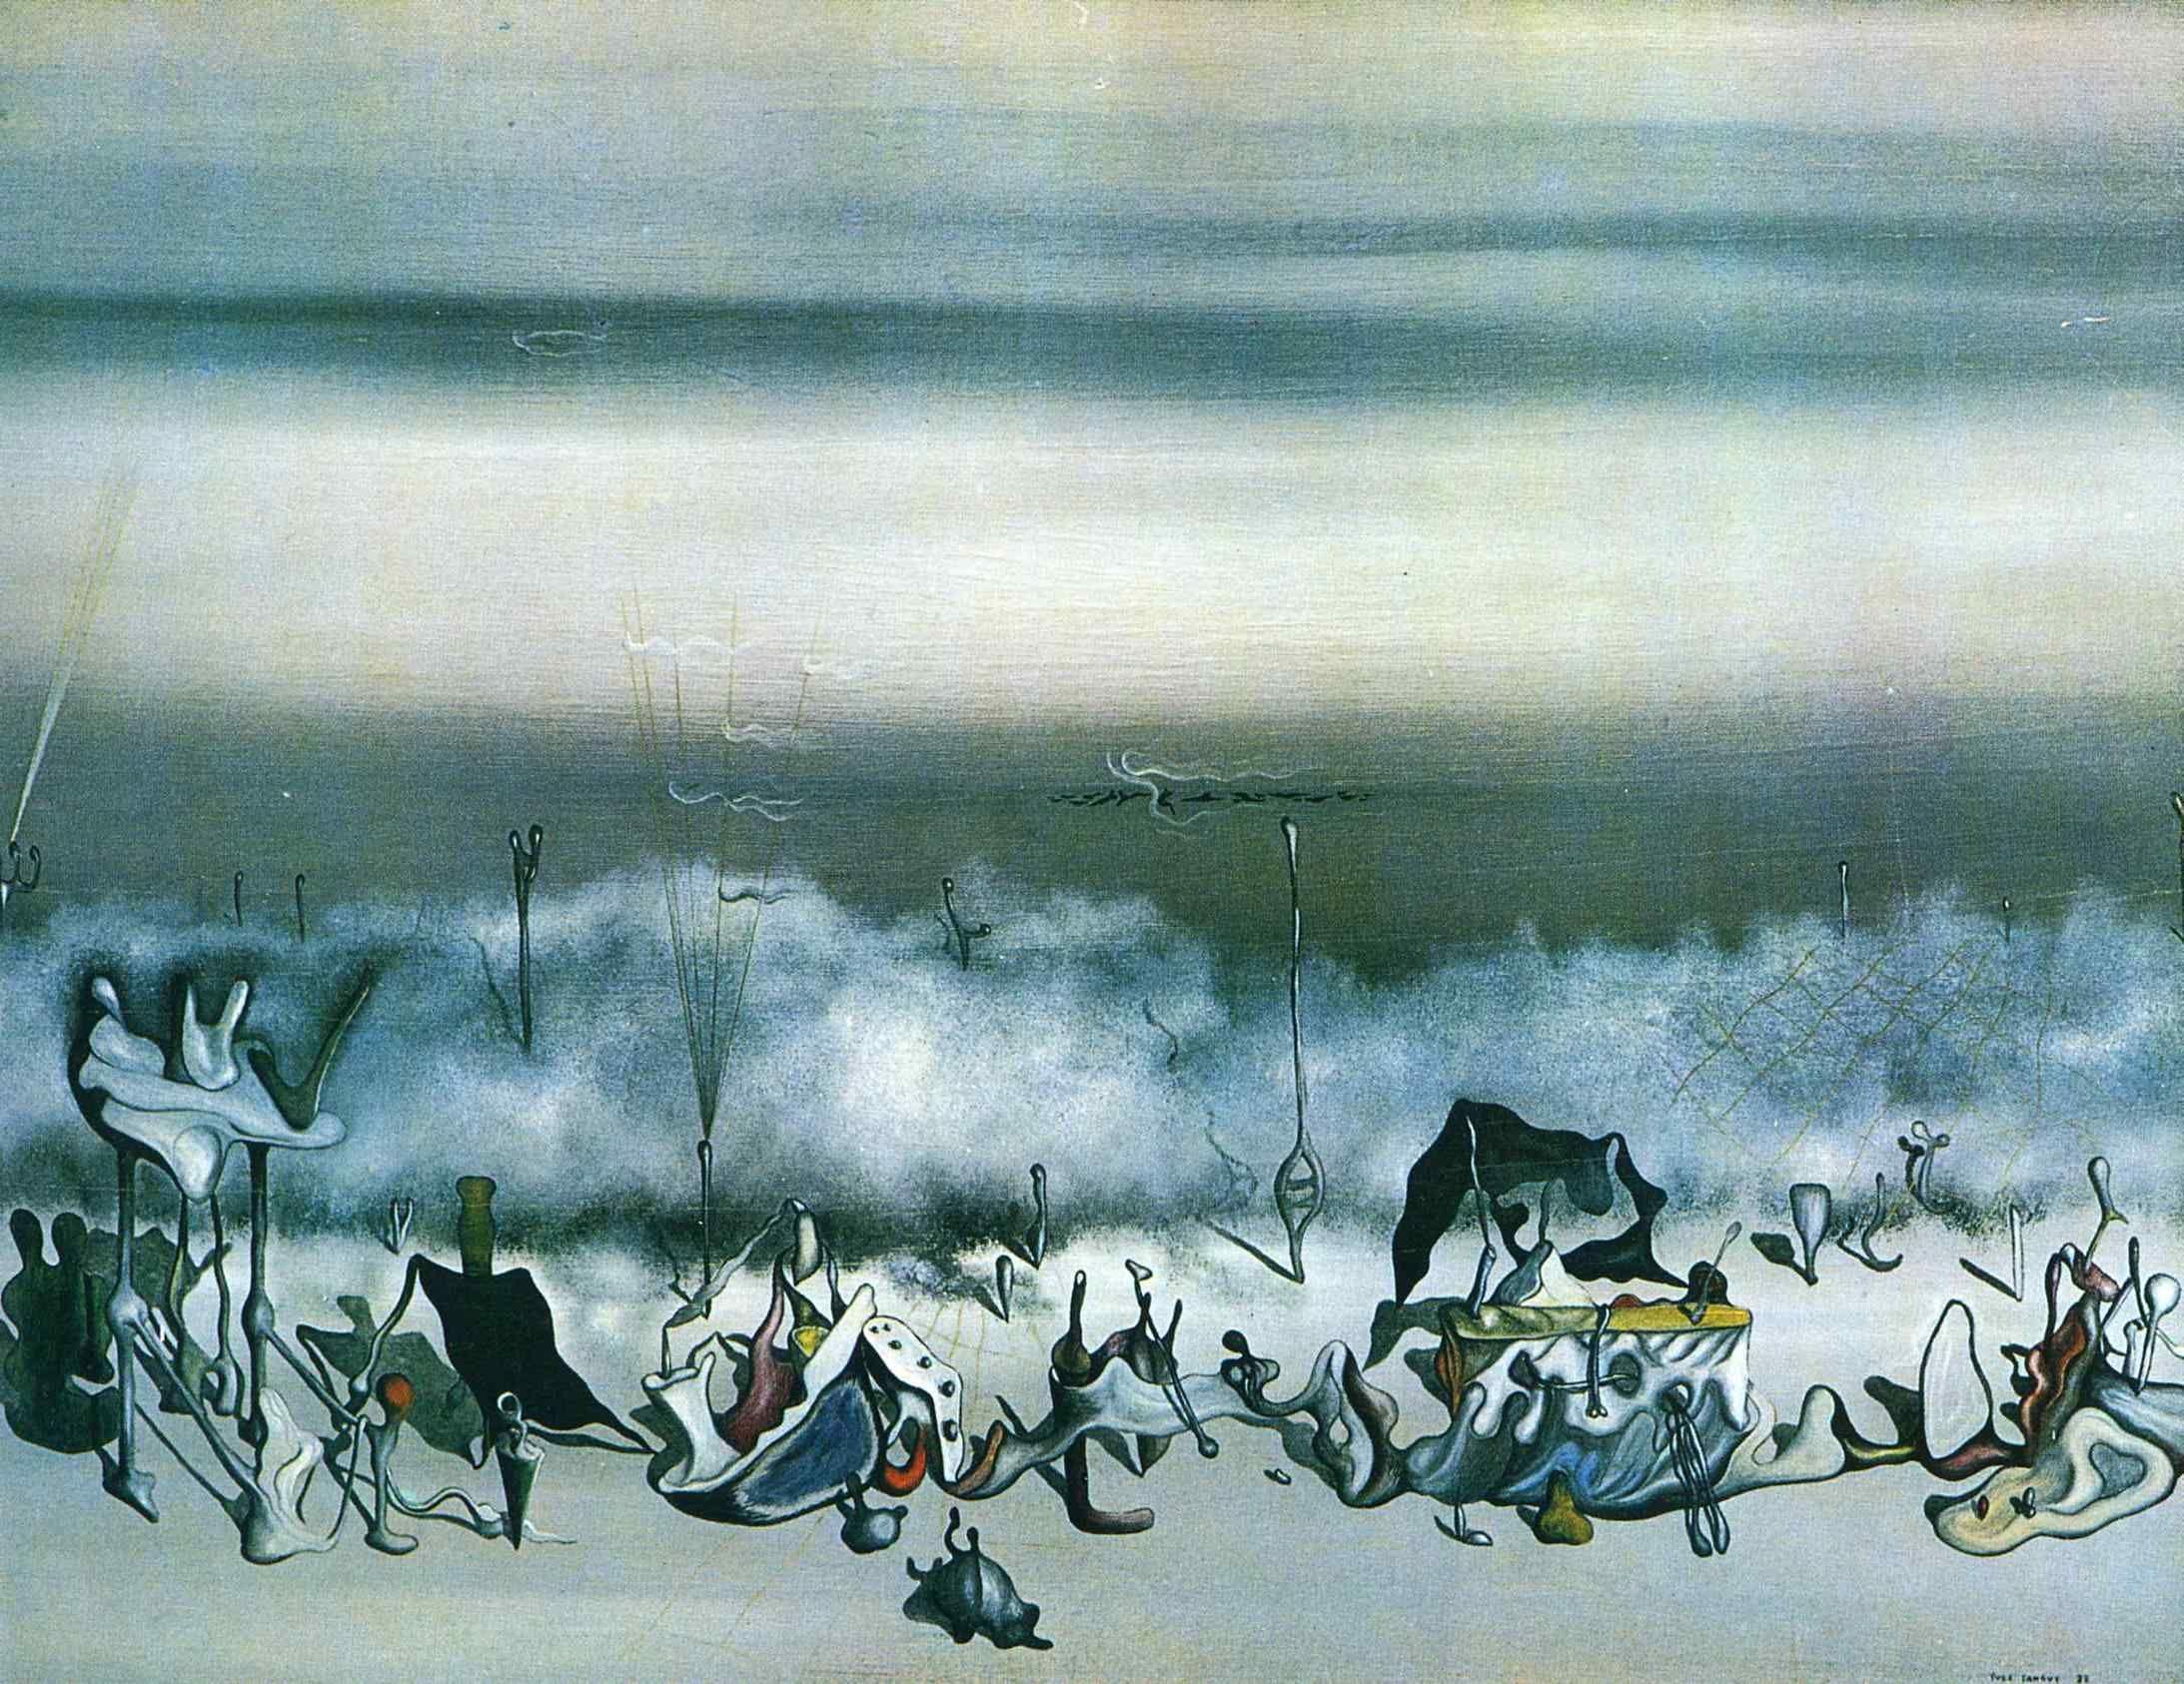 Yves Tanguy シュルレアリスム アート